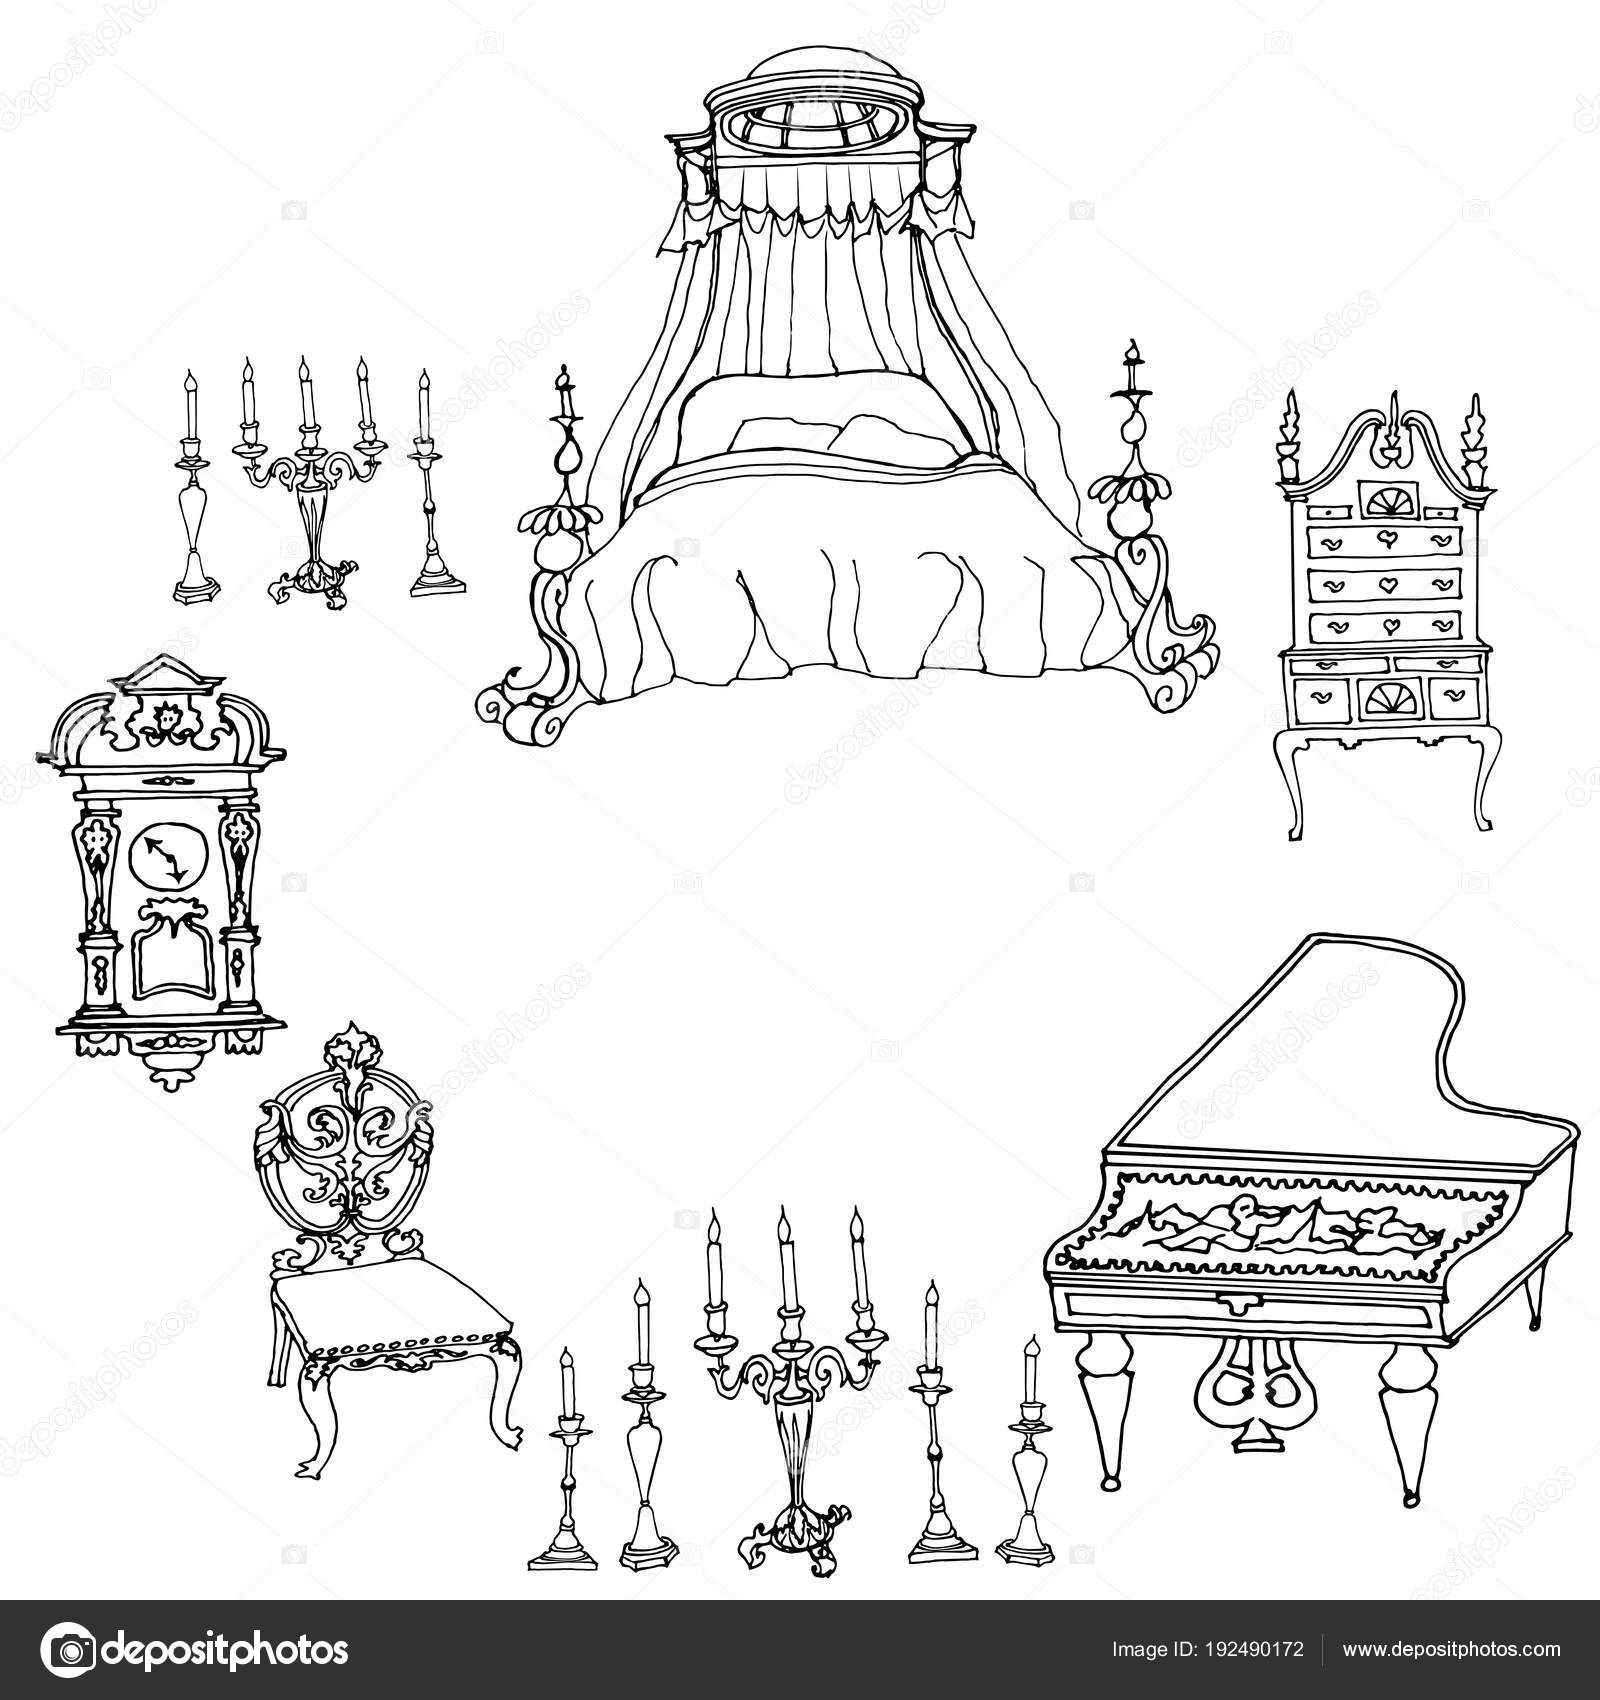 https://st3.depositphotos.com/10365226/19249/v/1600/depositphotos_192490172-stock-illustration-outline-in-lines-on-a.jpg